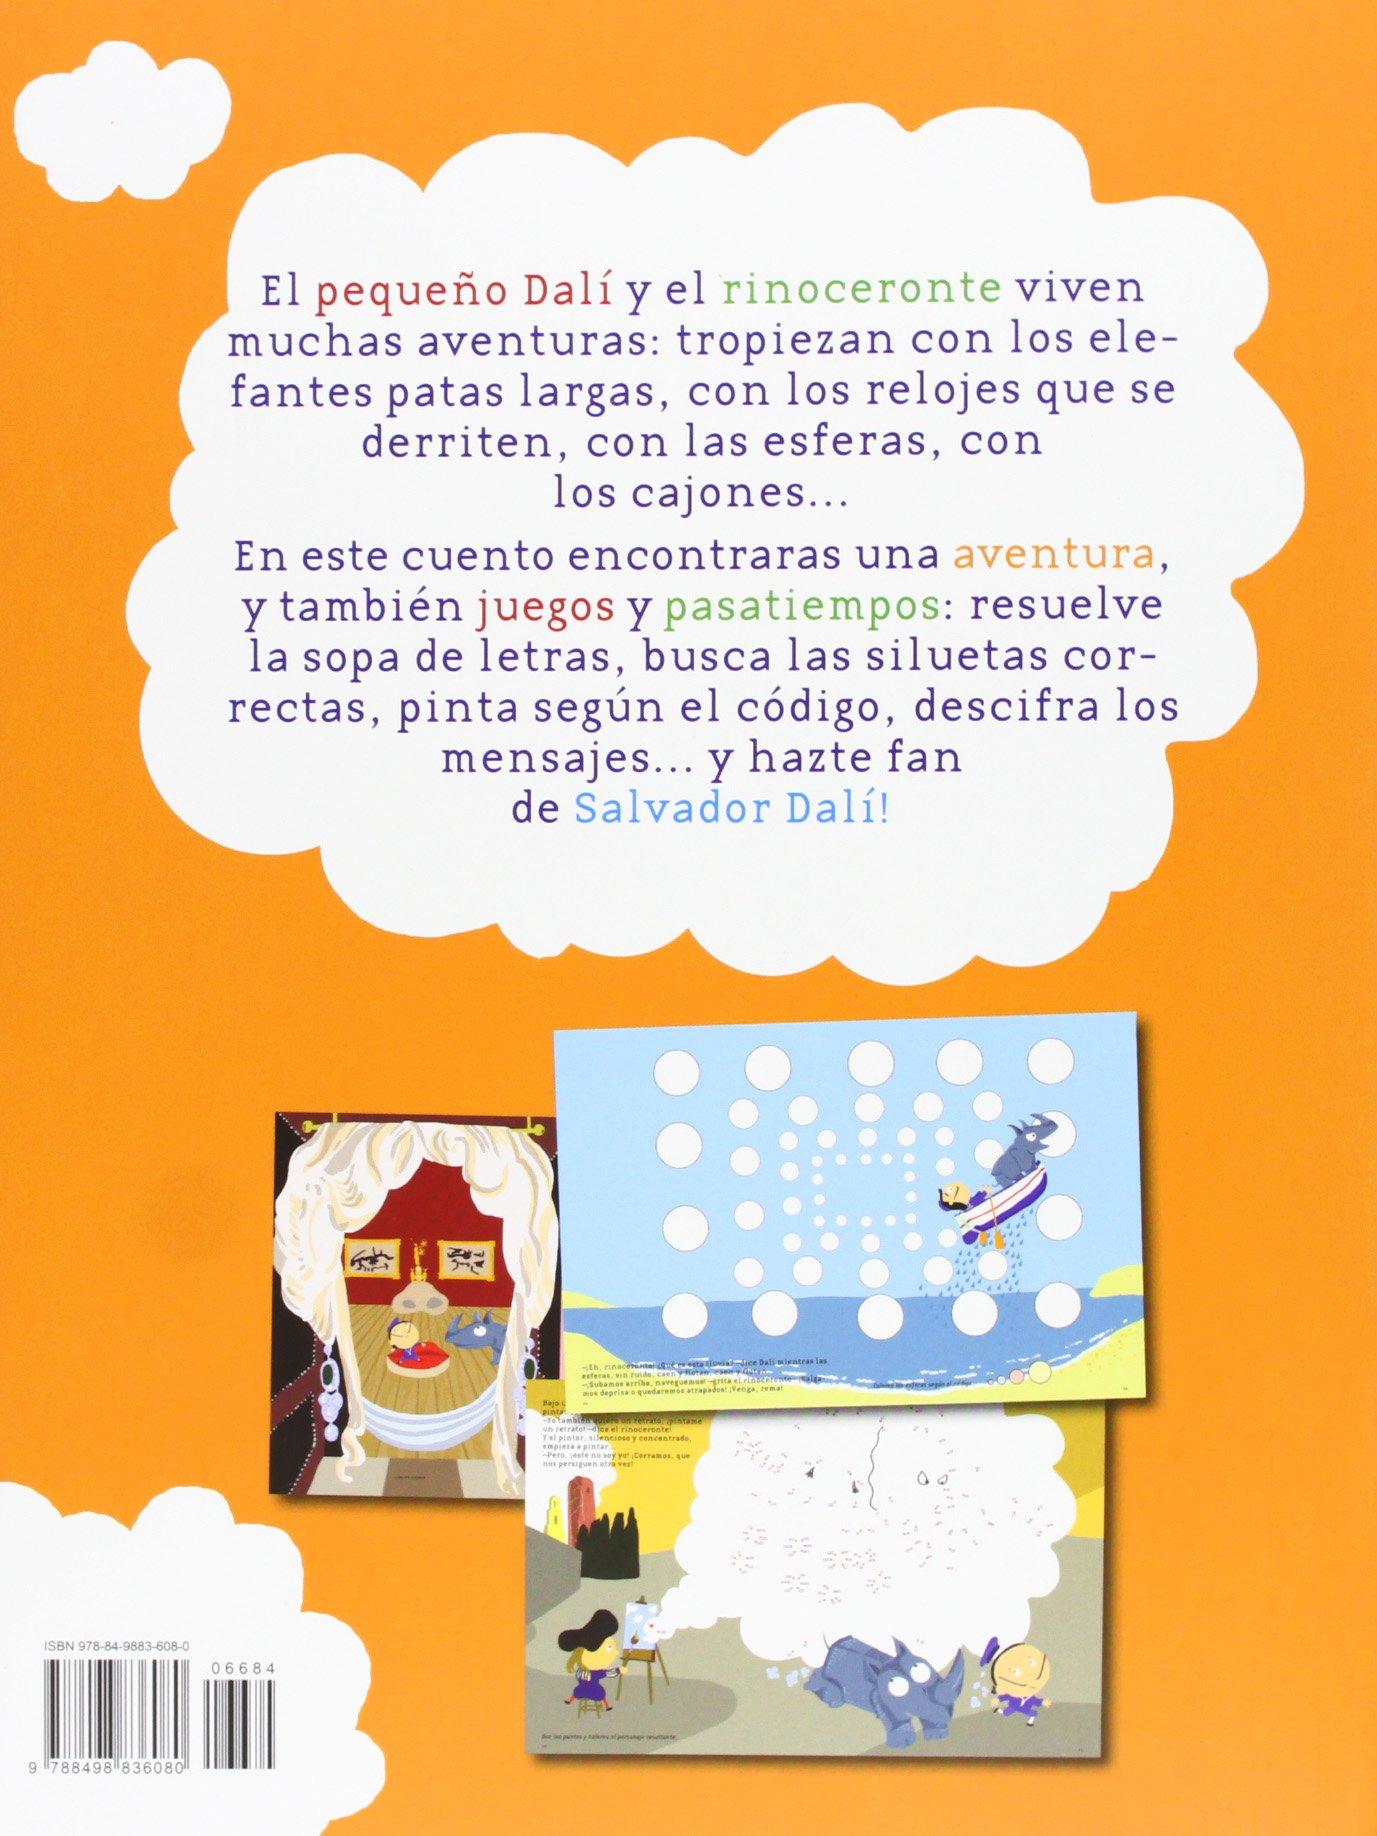 ¡Ven conmigo, pequeño Dalí!: 9788498836080: Amazon.com: Books